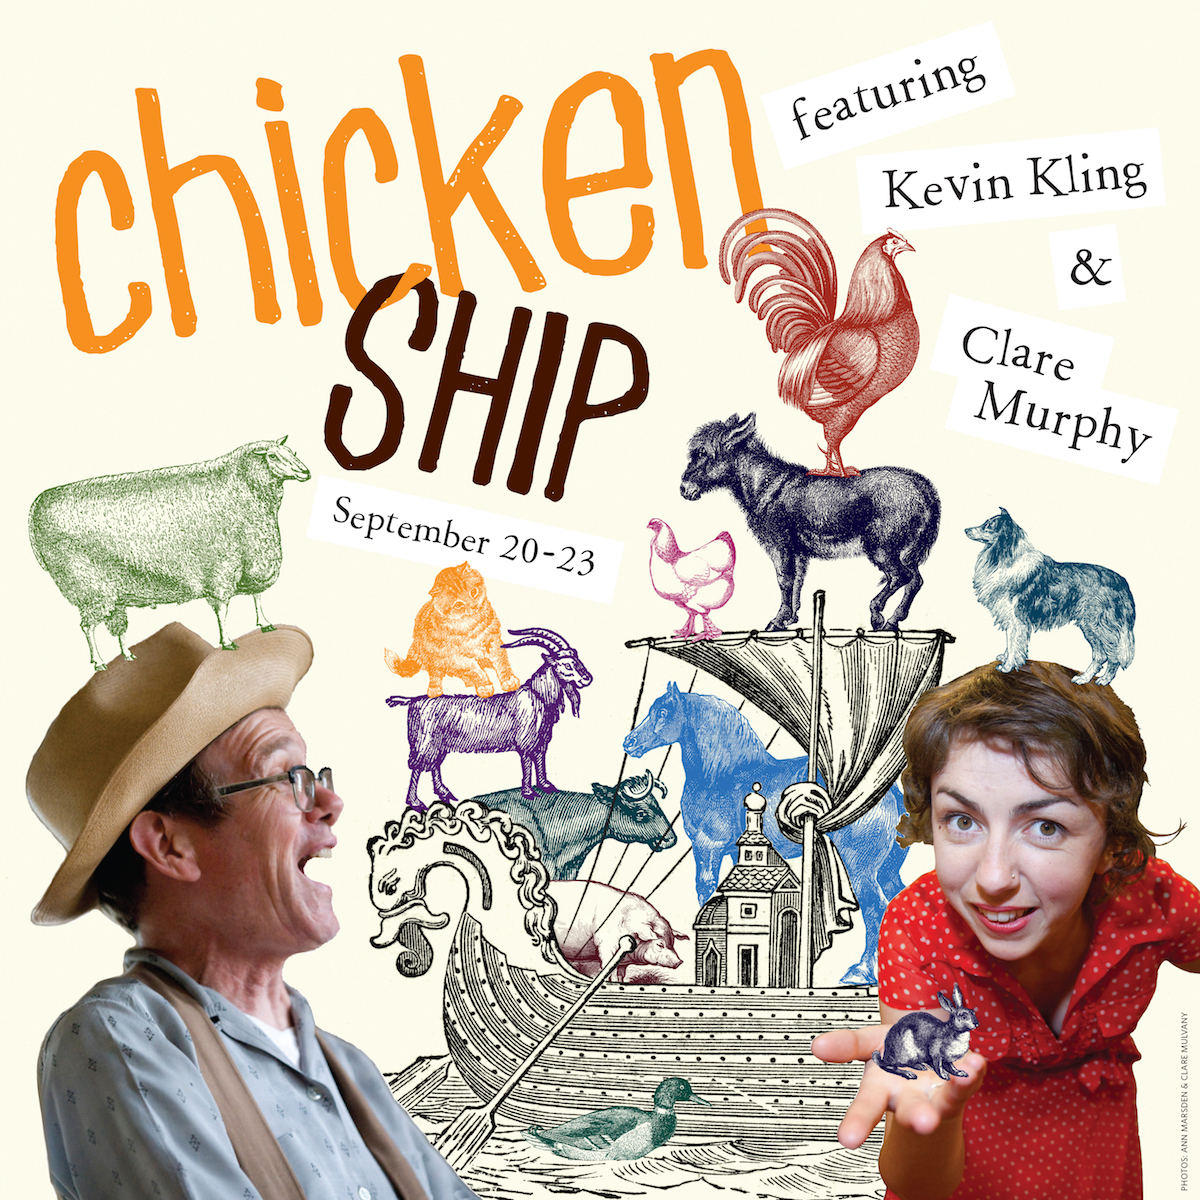 ChickenShipArt-NoLogo copy.jpg